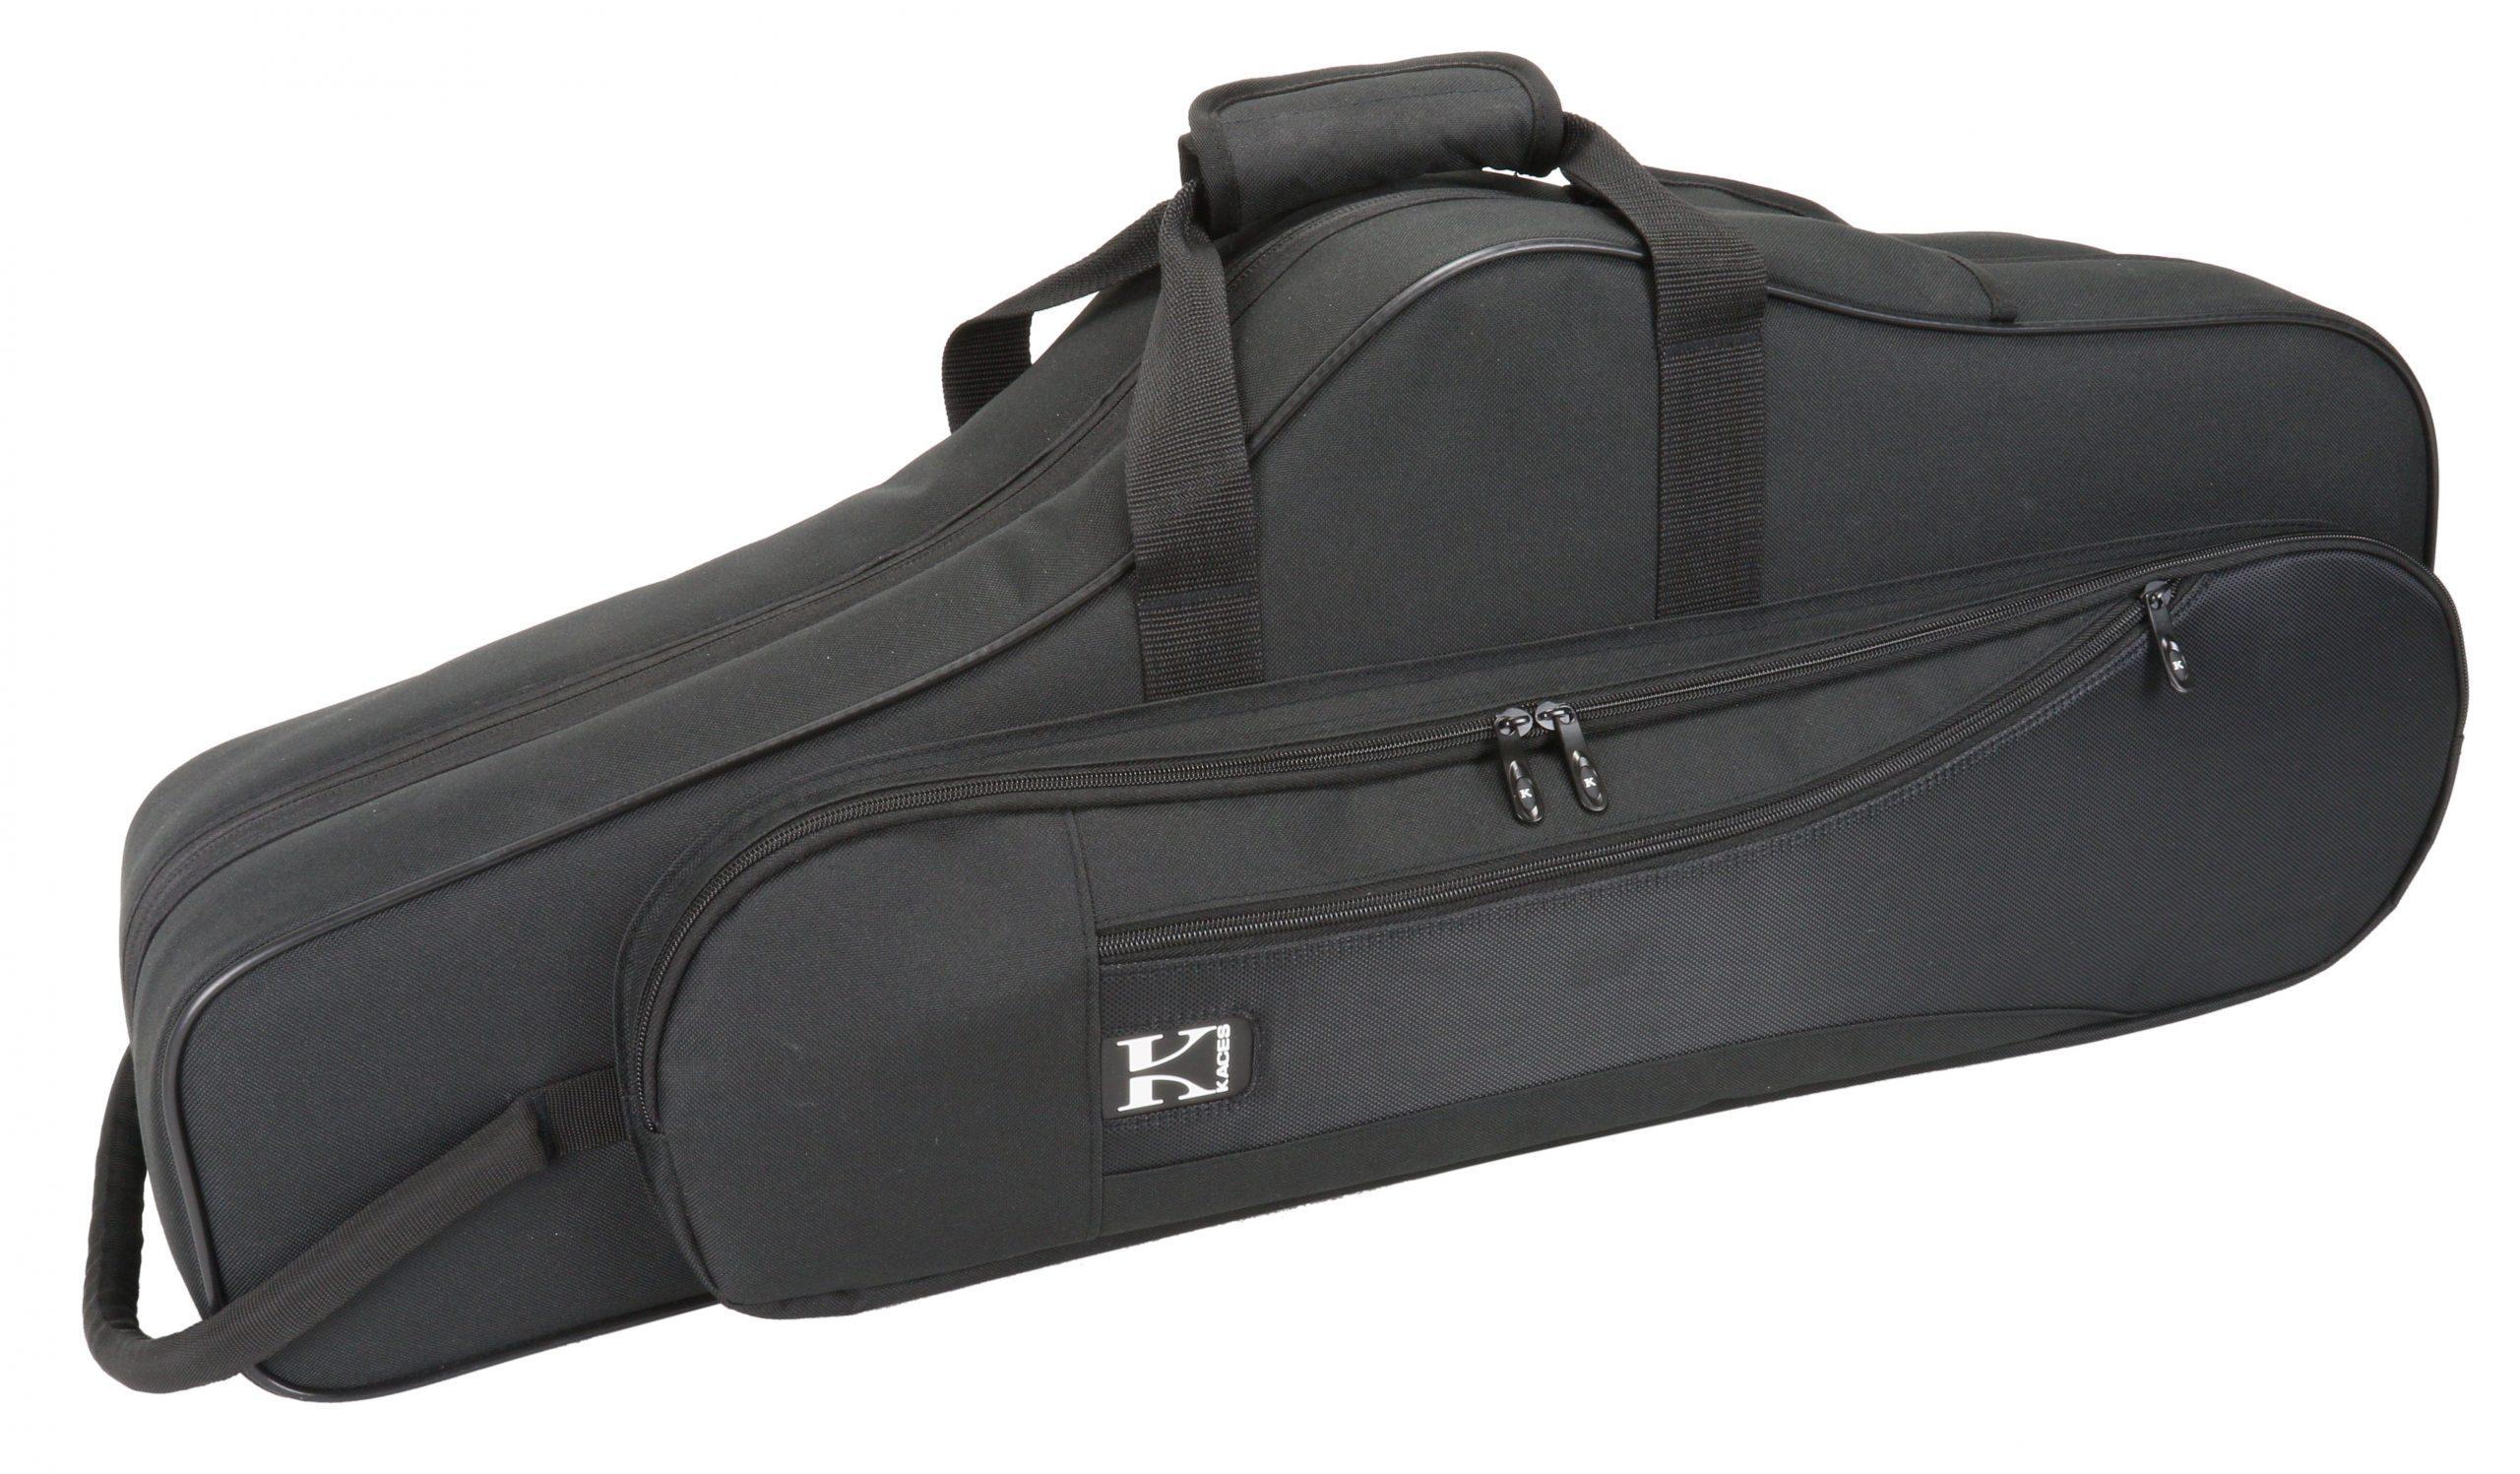 Kaces Lightweight Hardshell Tenor Sax Case, Black